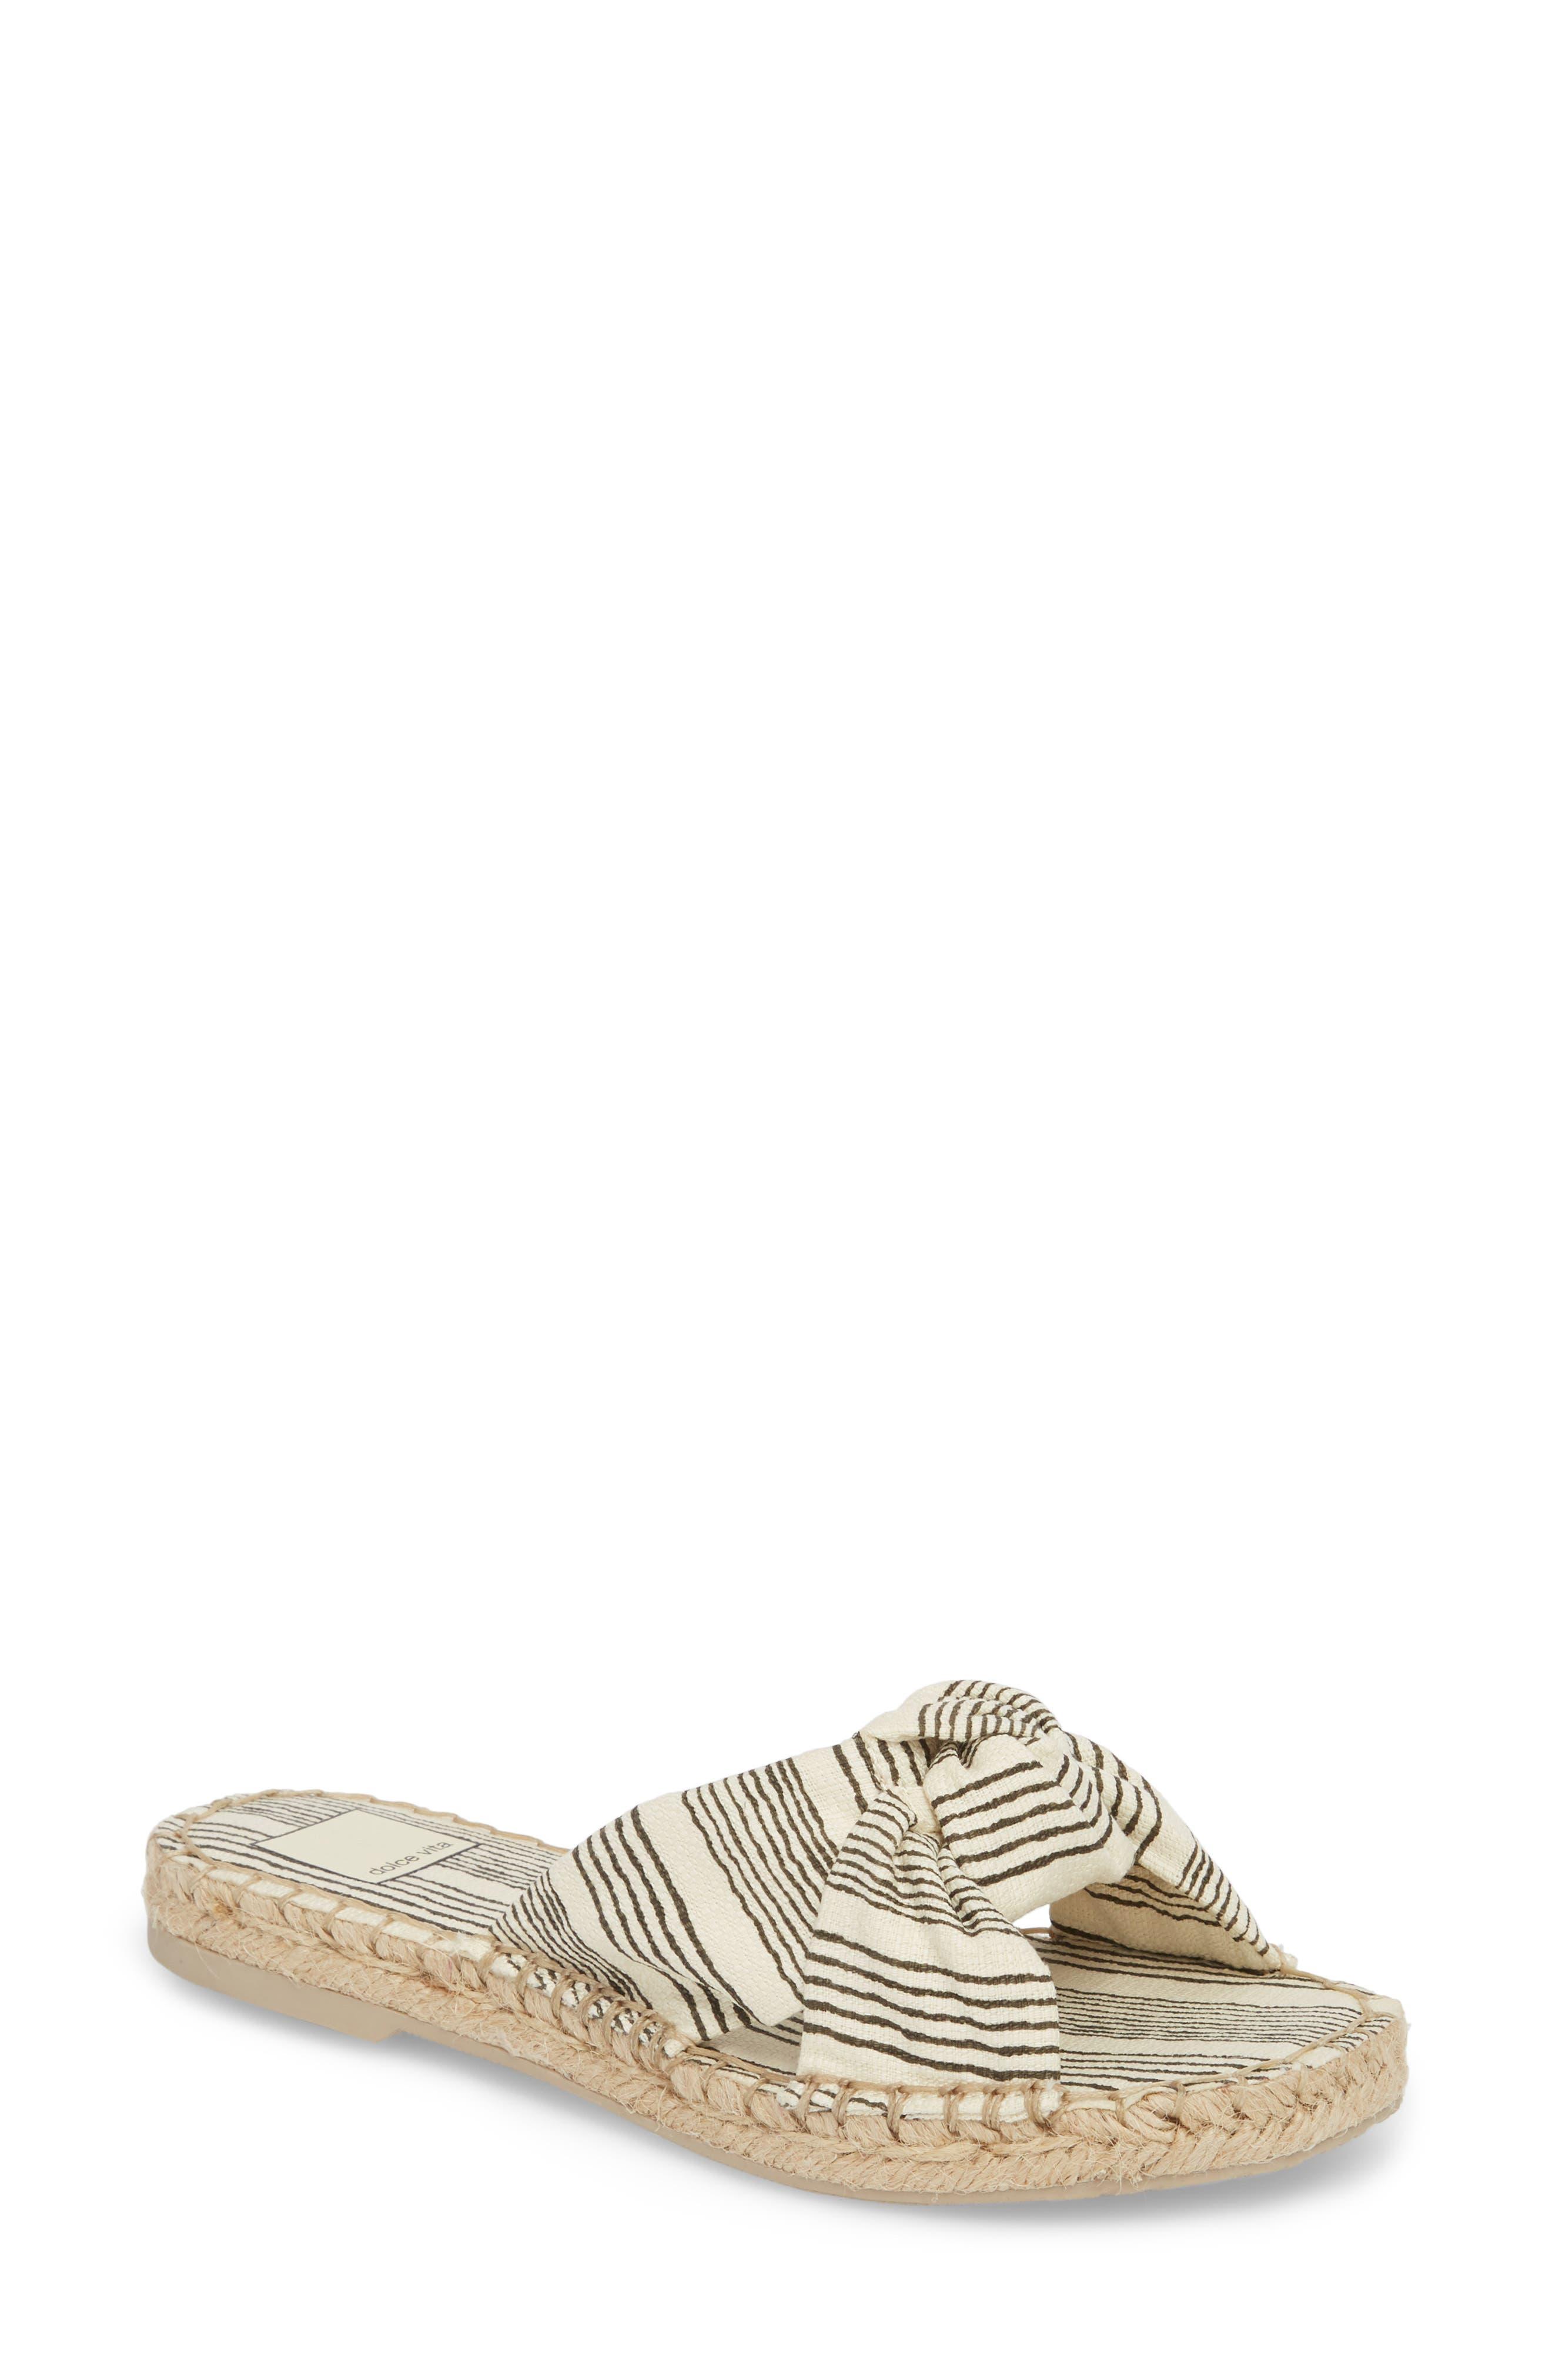 Alternate Image 1 Selected - Dolce Vita Benicia Knotted Slide Sandal (Women)